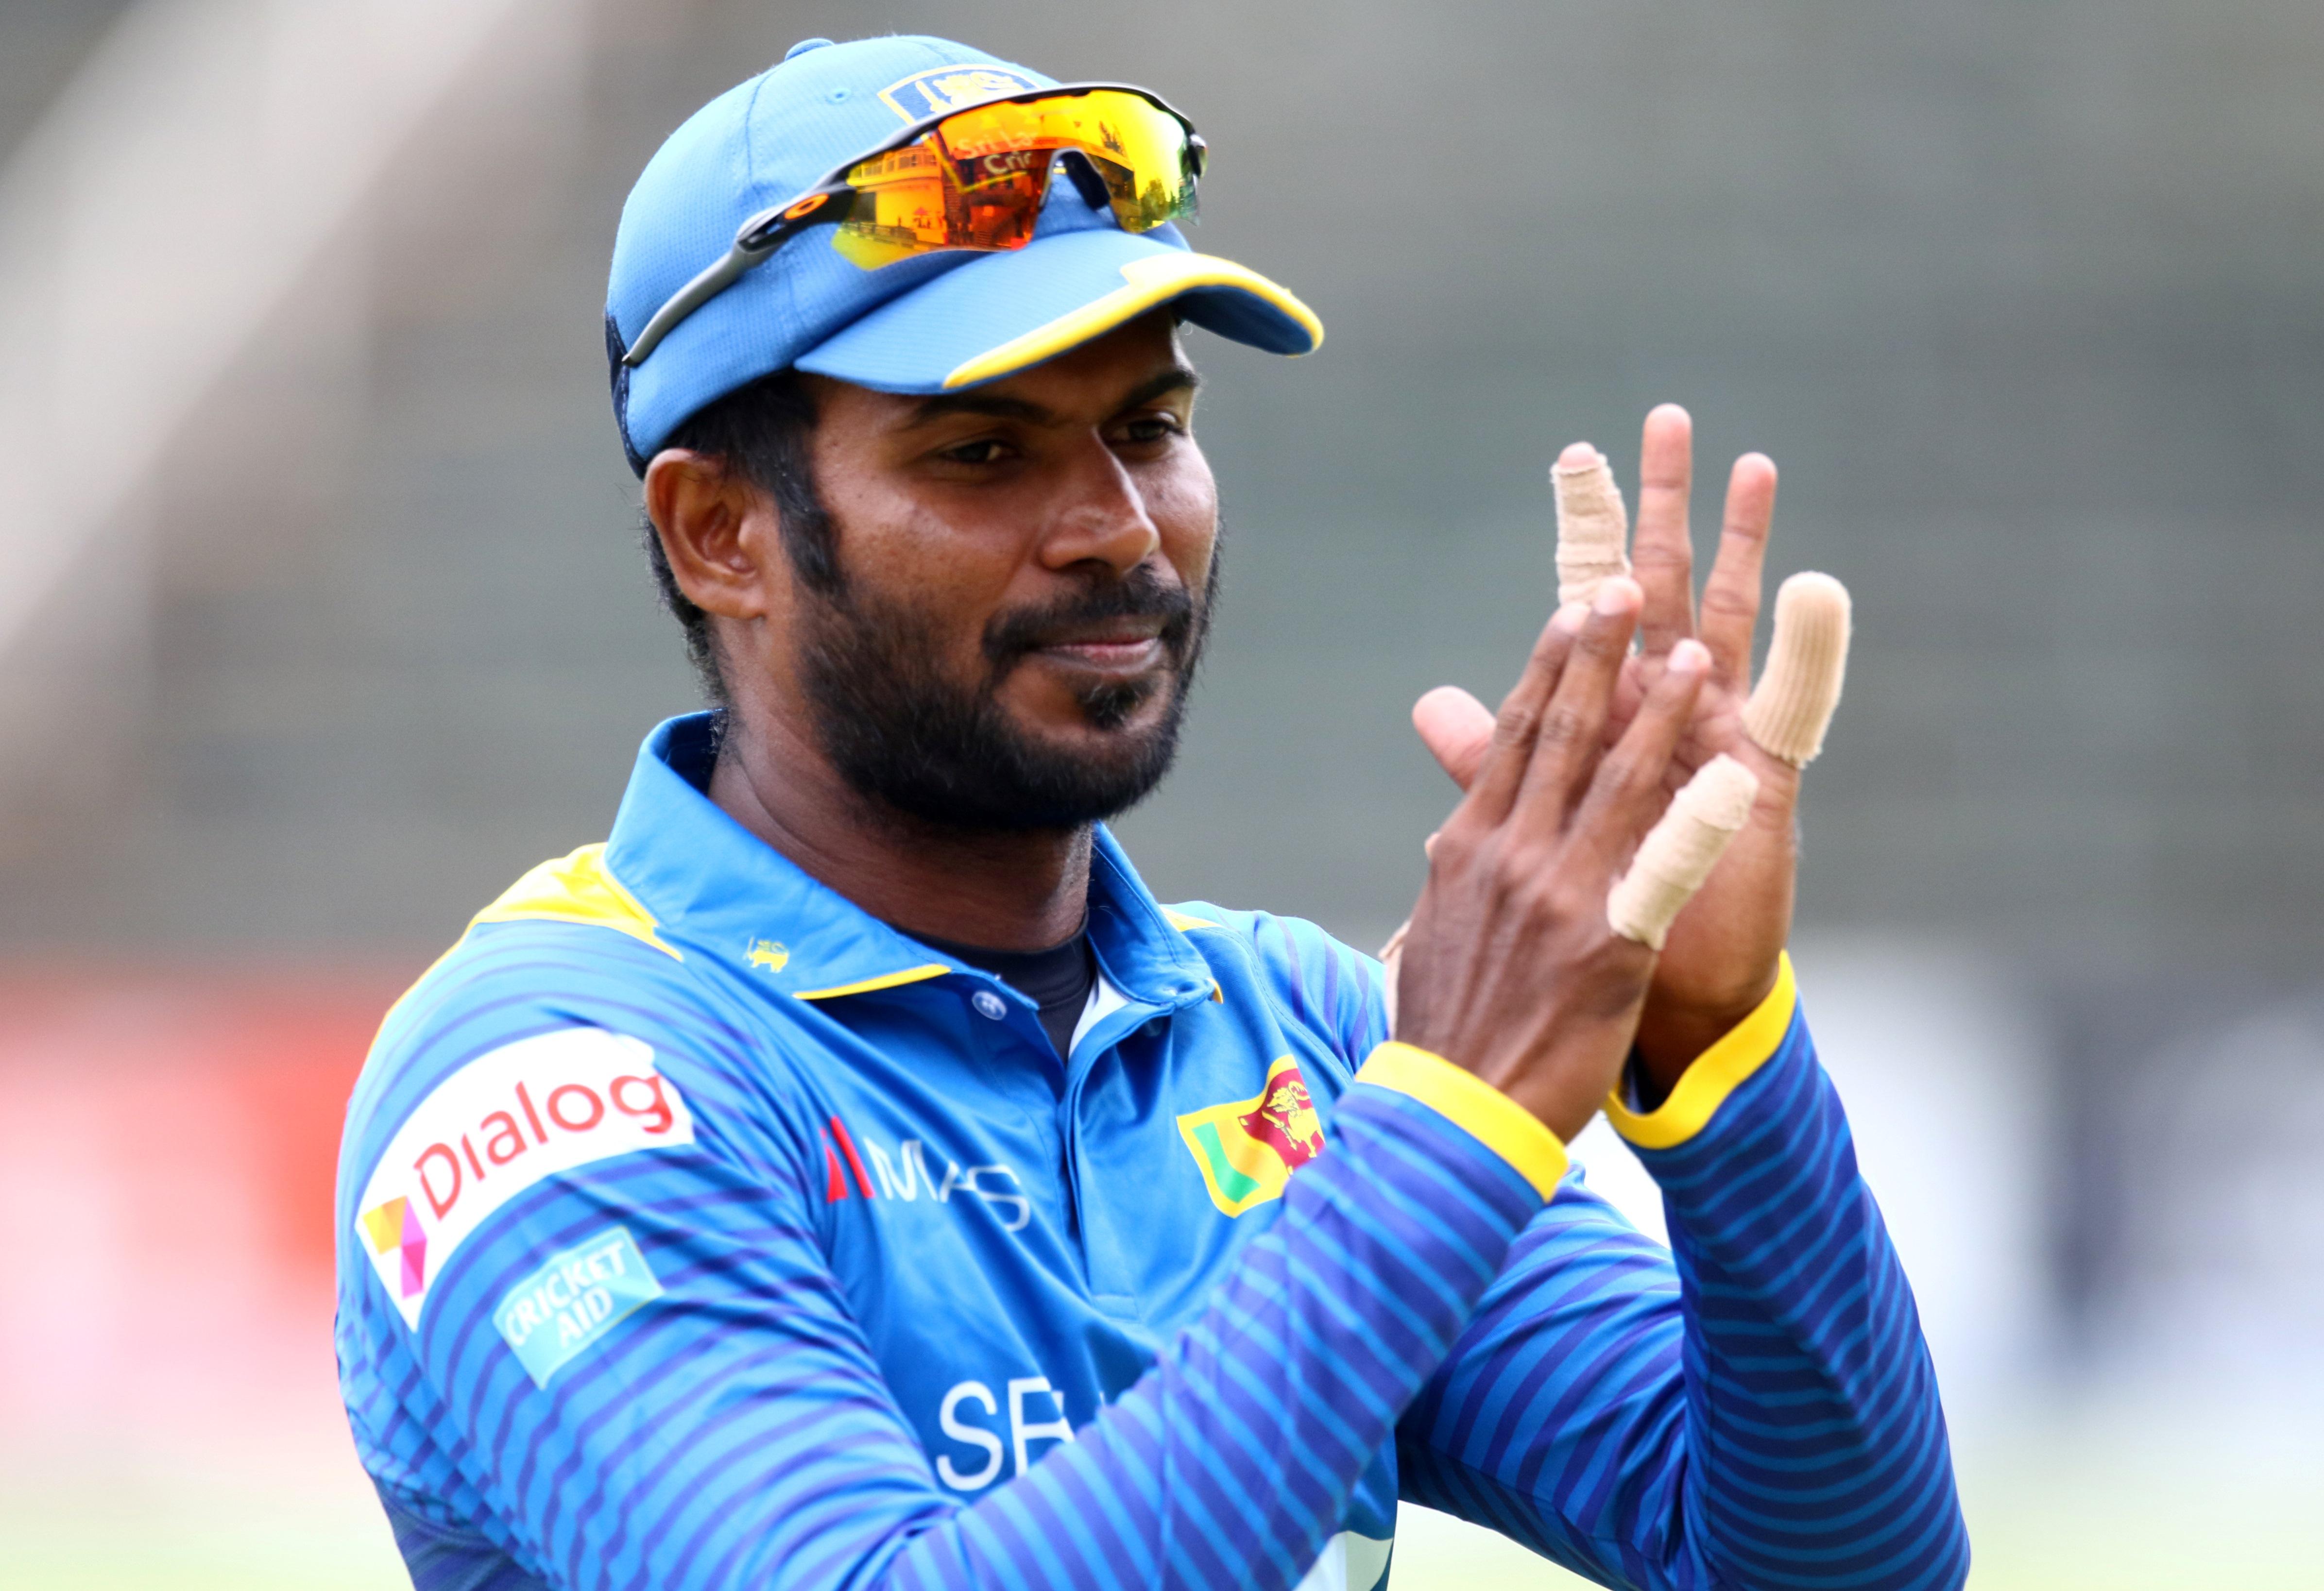 Sri Lanka opener Upul Tharanga calls time on 15-year international career - International Cricket Council